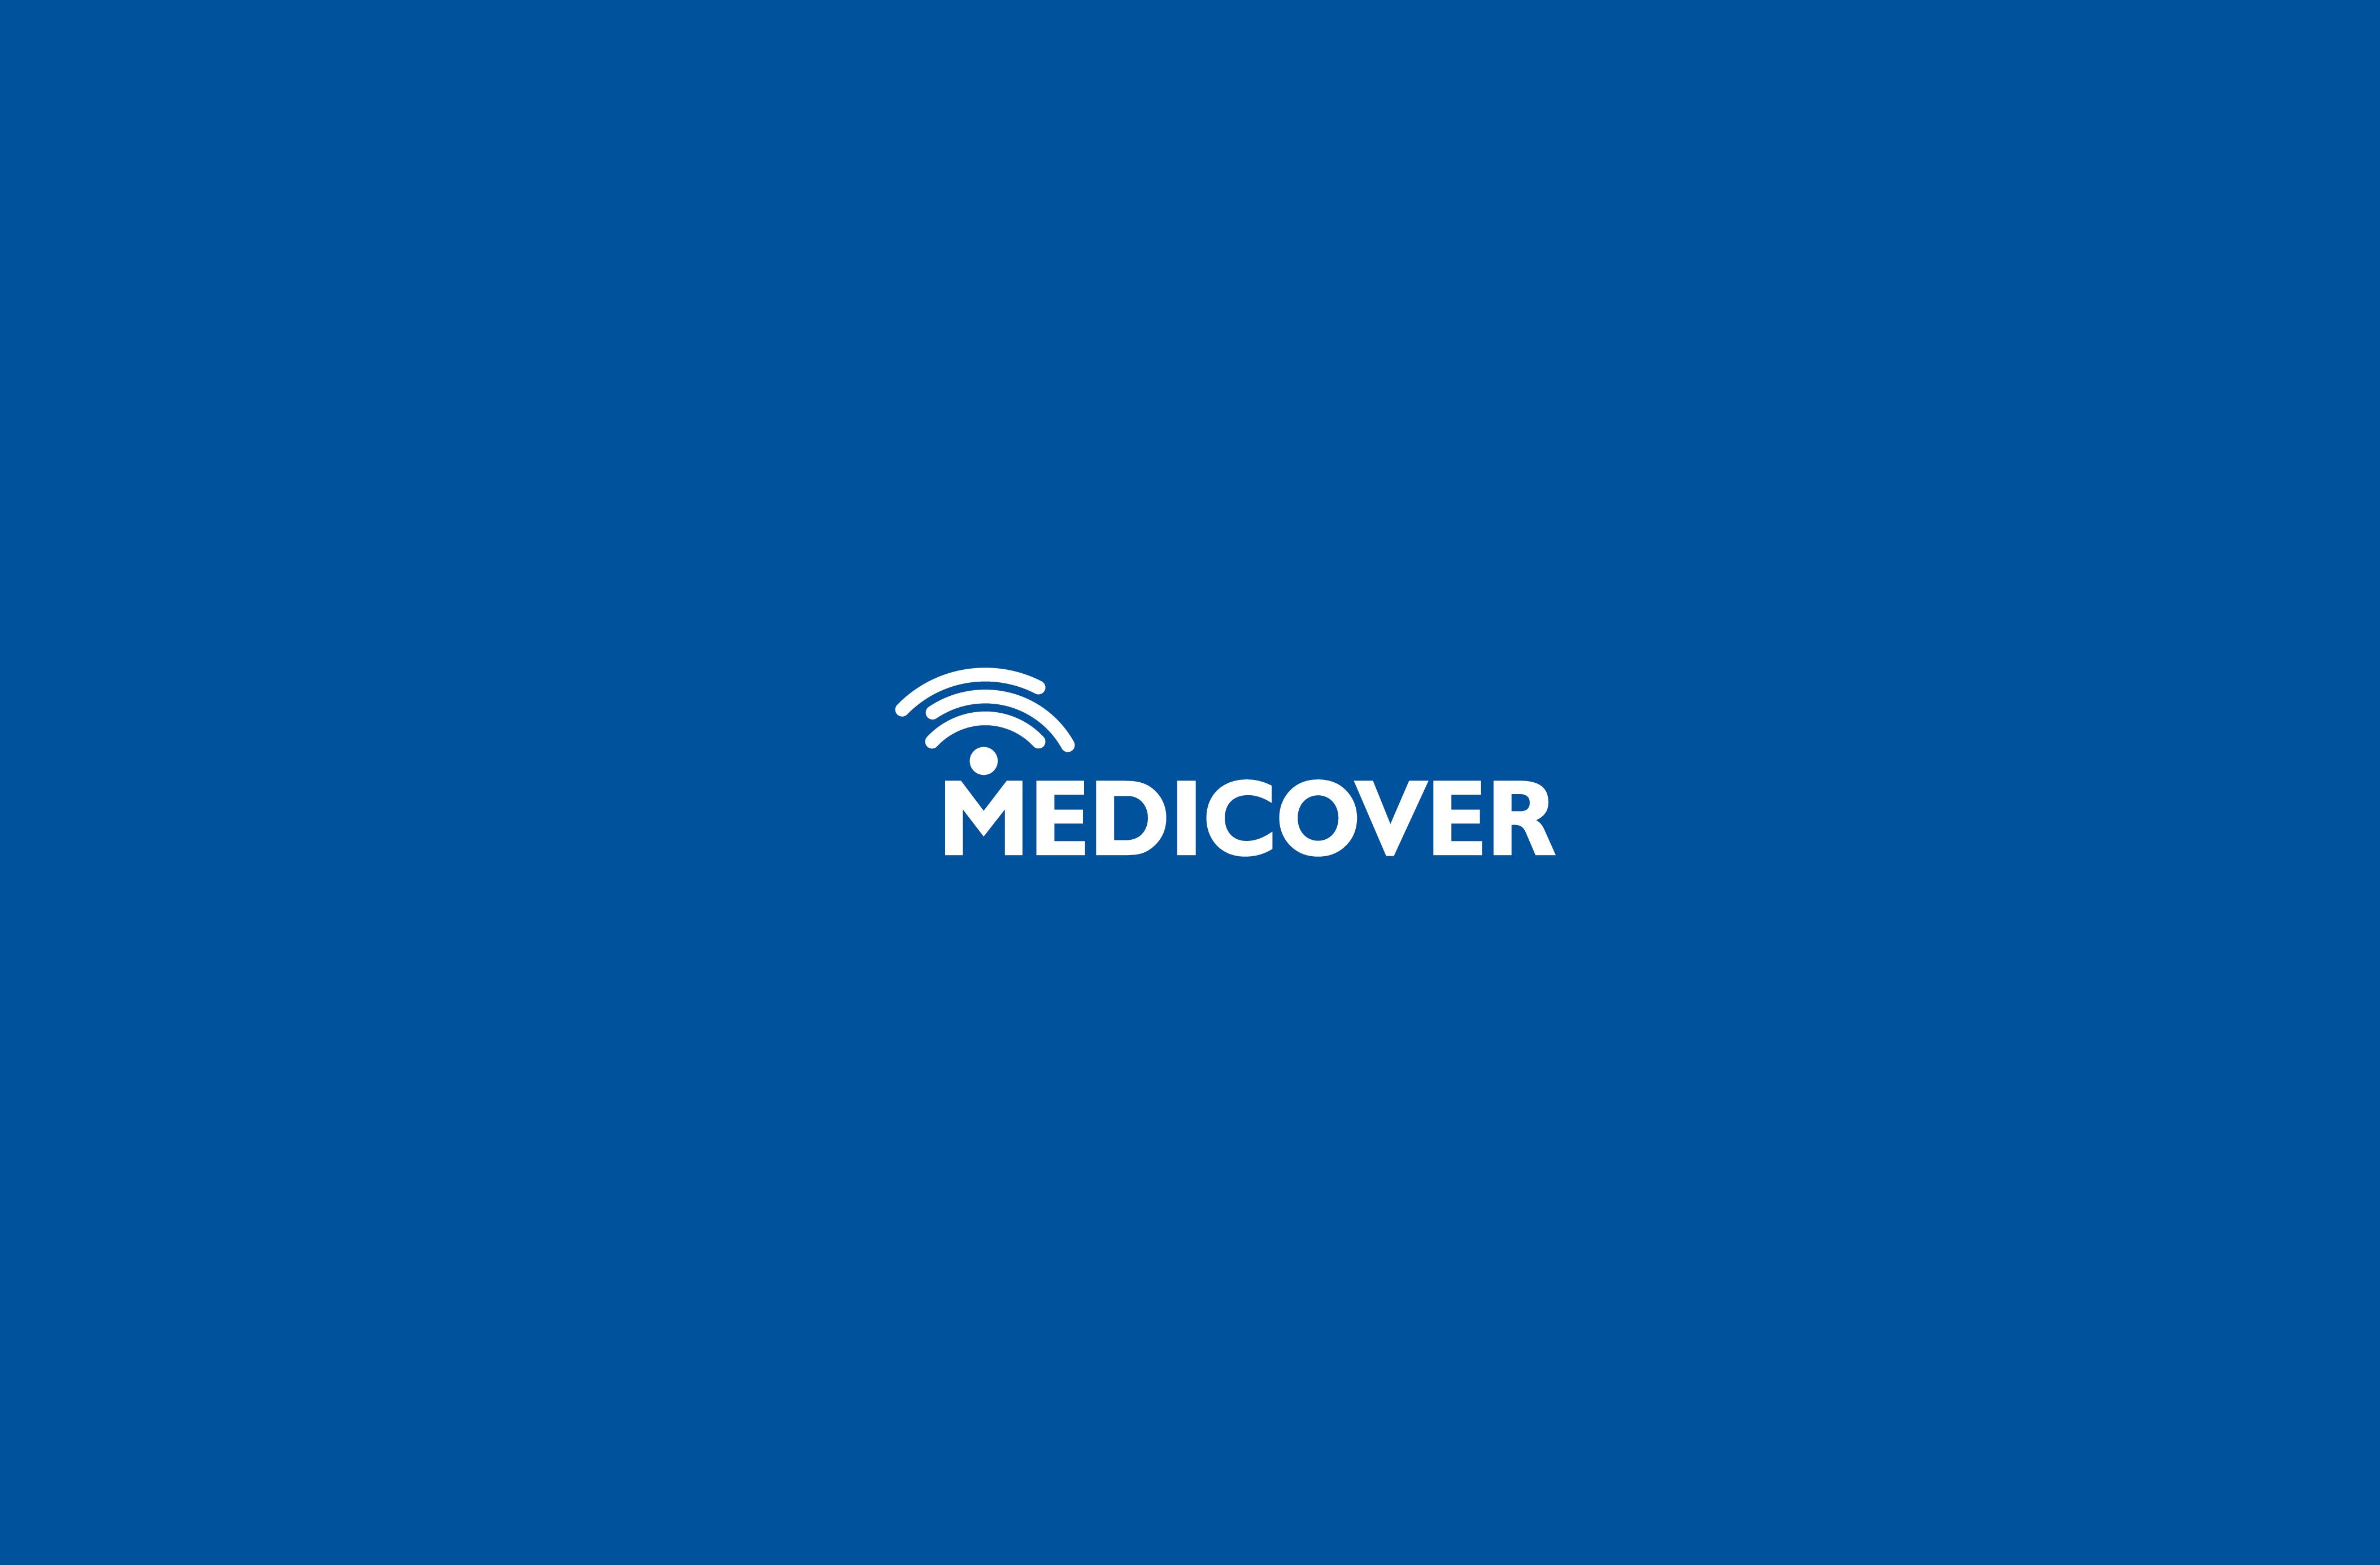 Medicover identity, app icons, interior standards